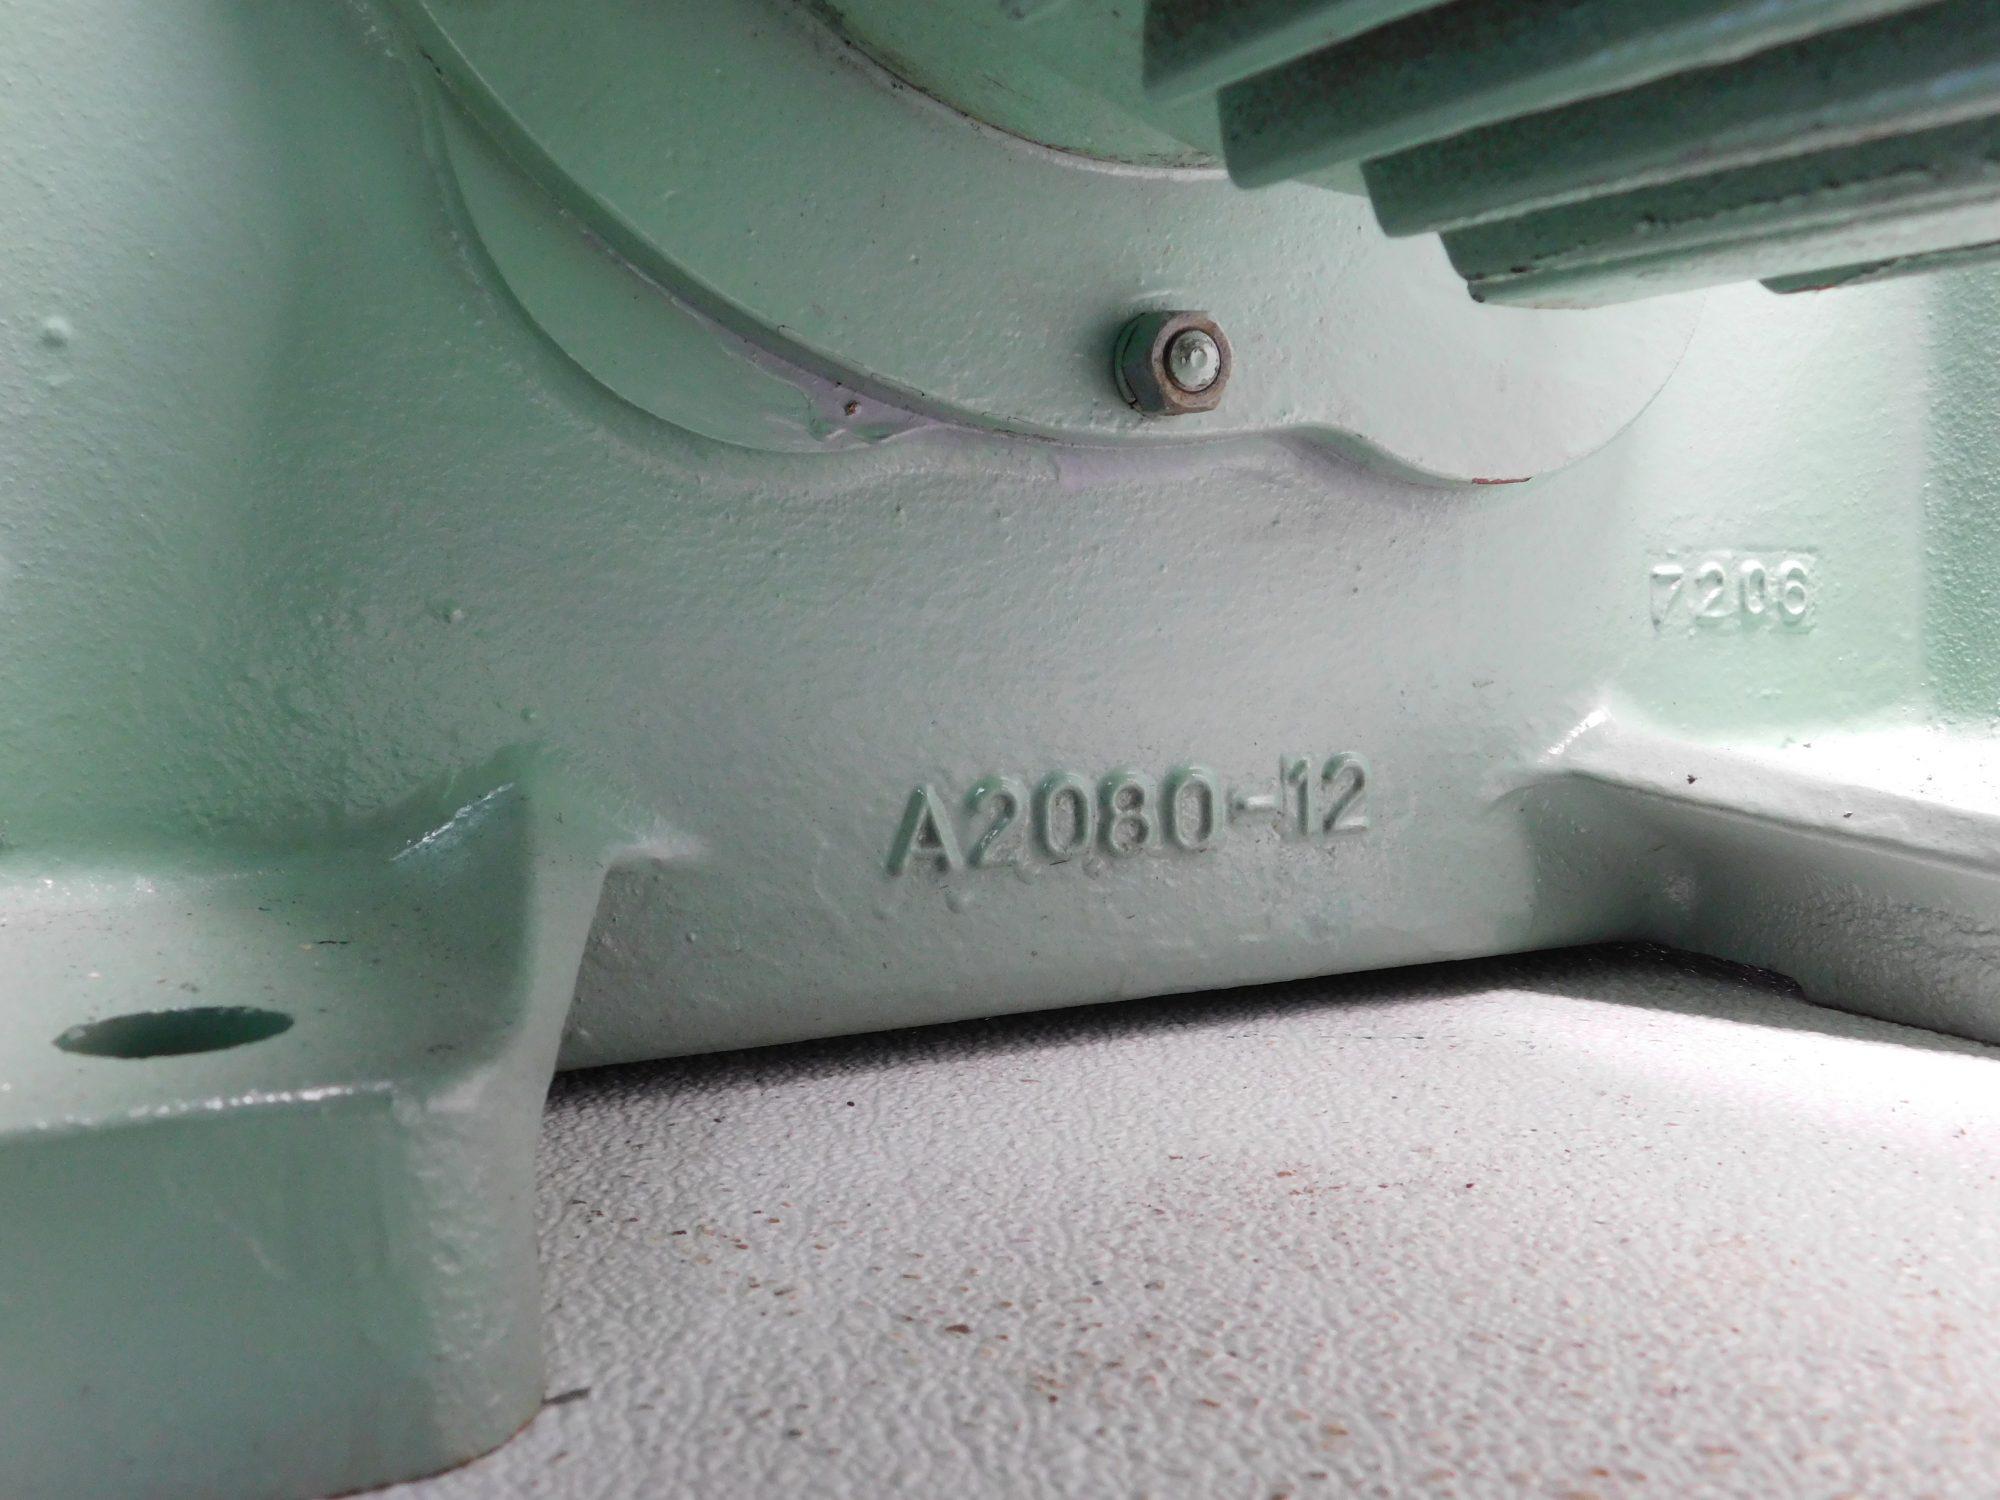 SKK AFT Gear Motor 10HP @1160RPM, Ratio 25.735:1, 45 RPM